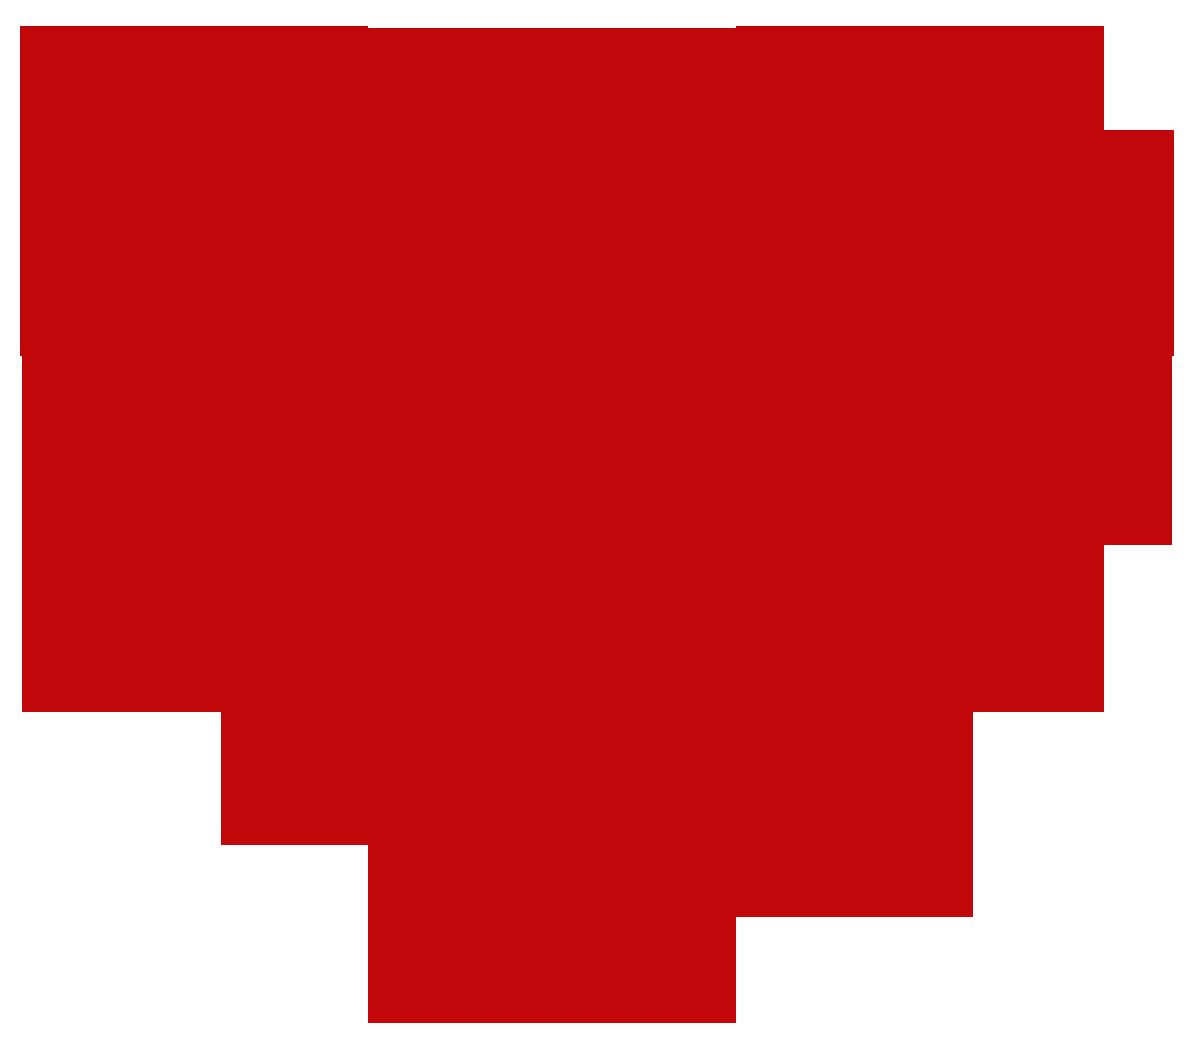 Love clipart. Clip art